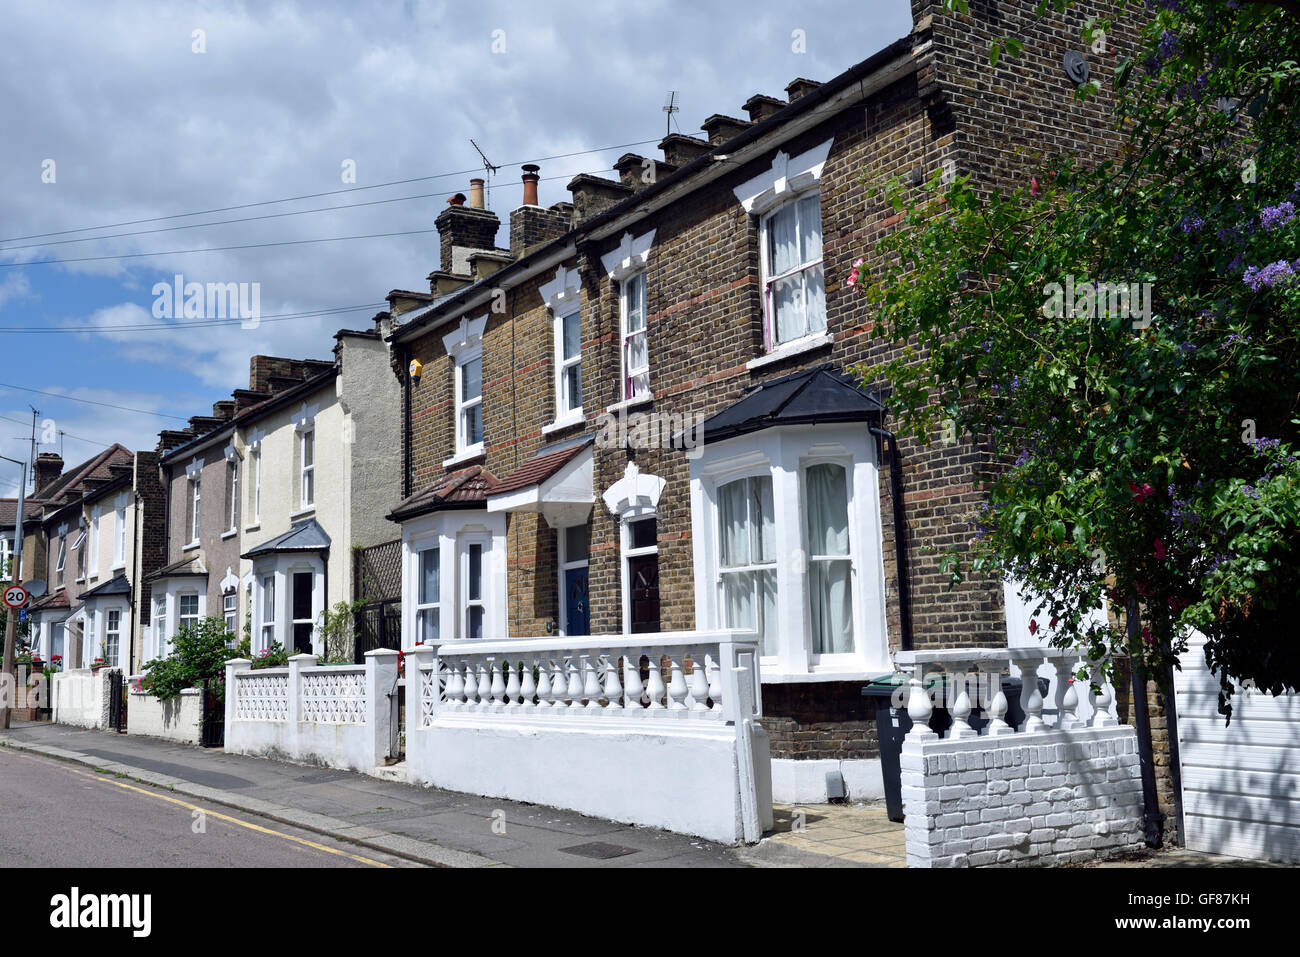 Two story terraced houses London Borough of Haringey England Britain UK - Stock Image